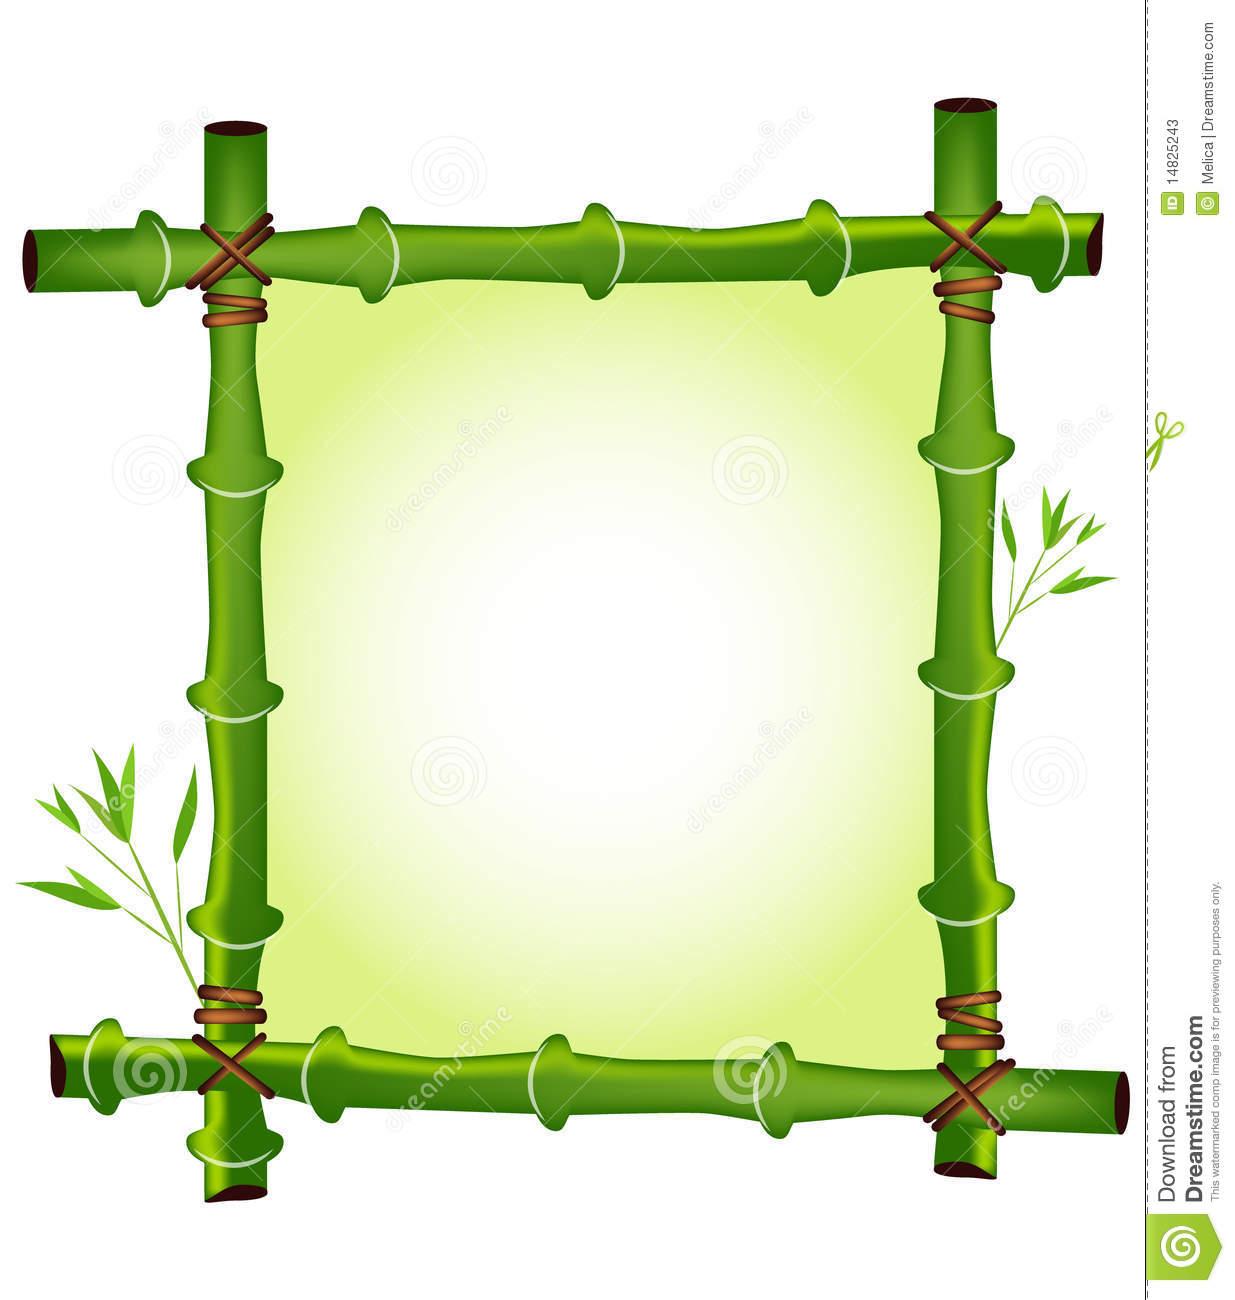 jungle frame clipart - Clipground